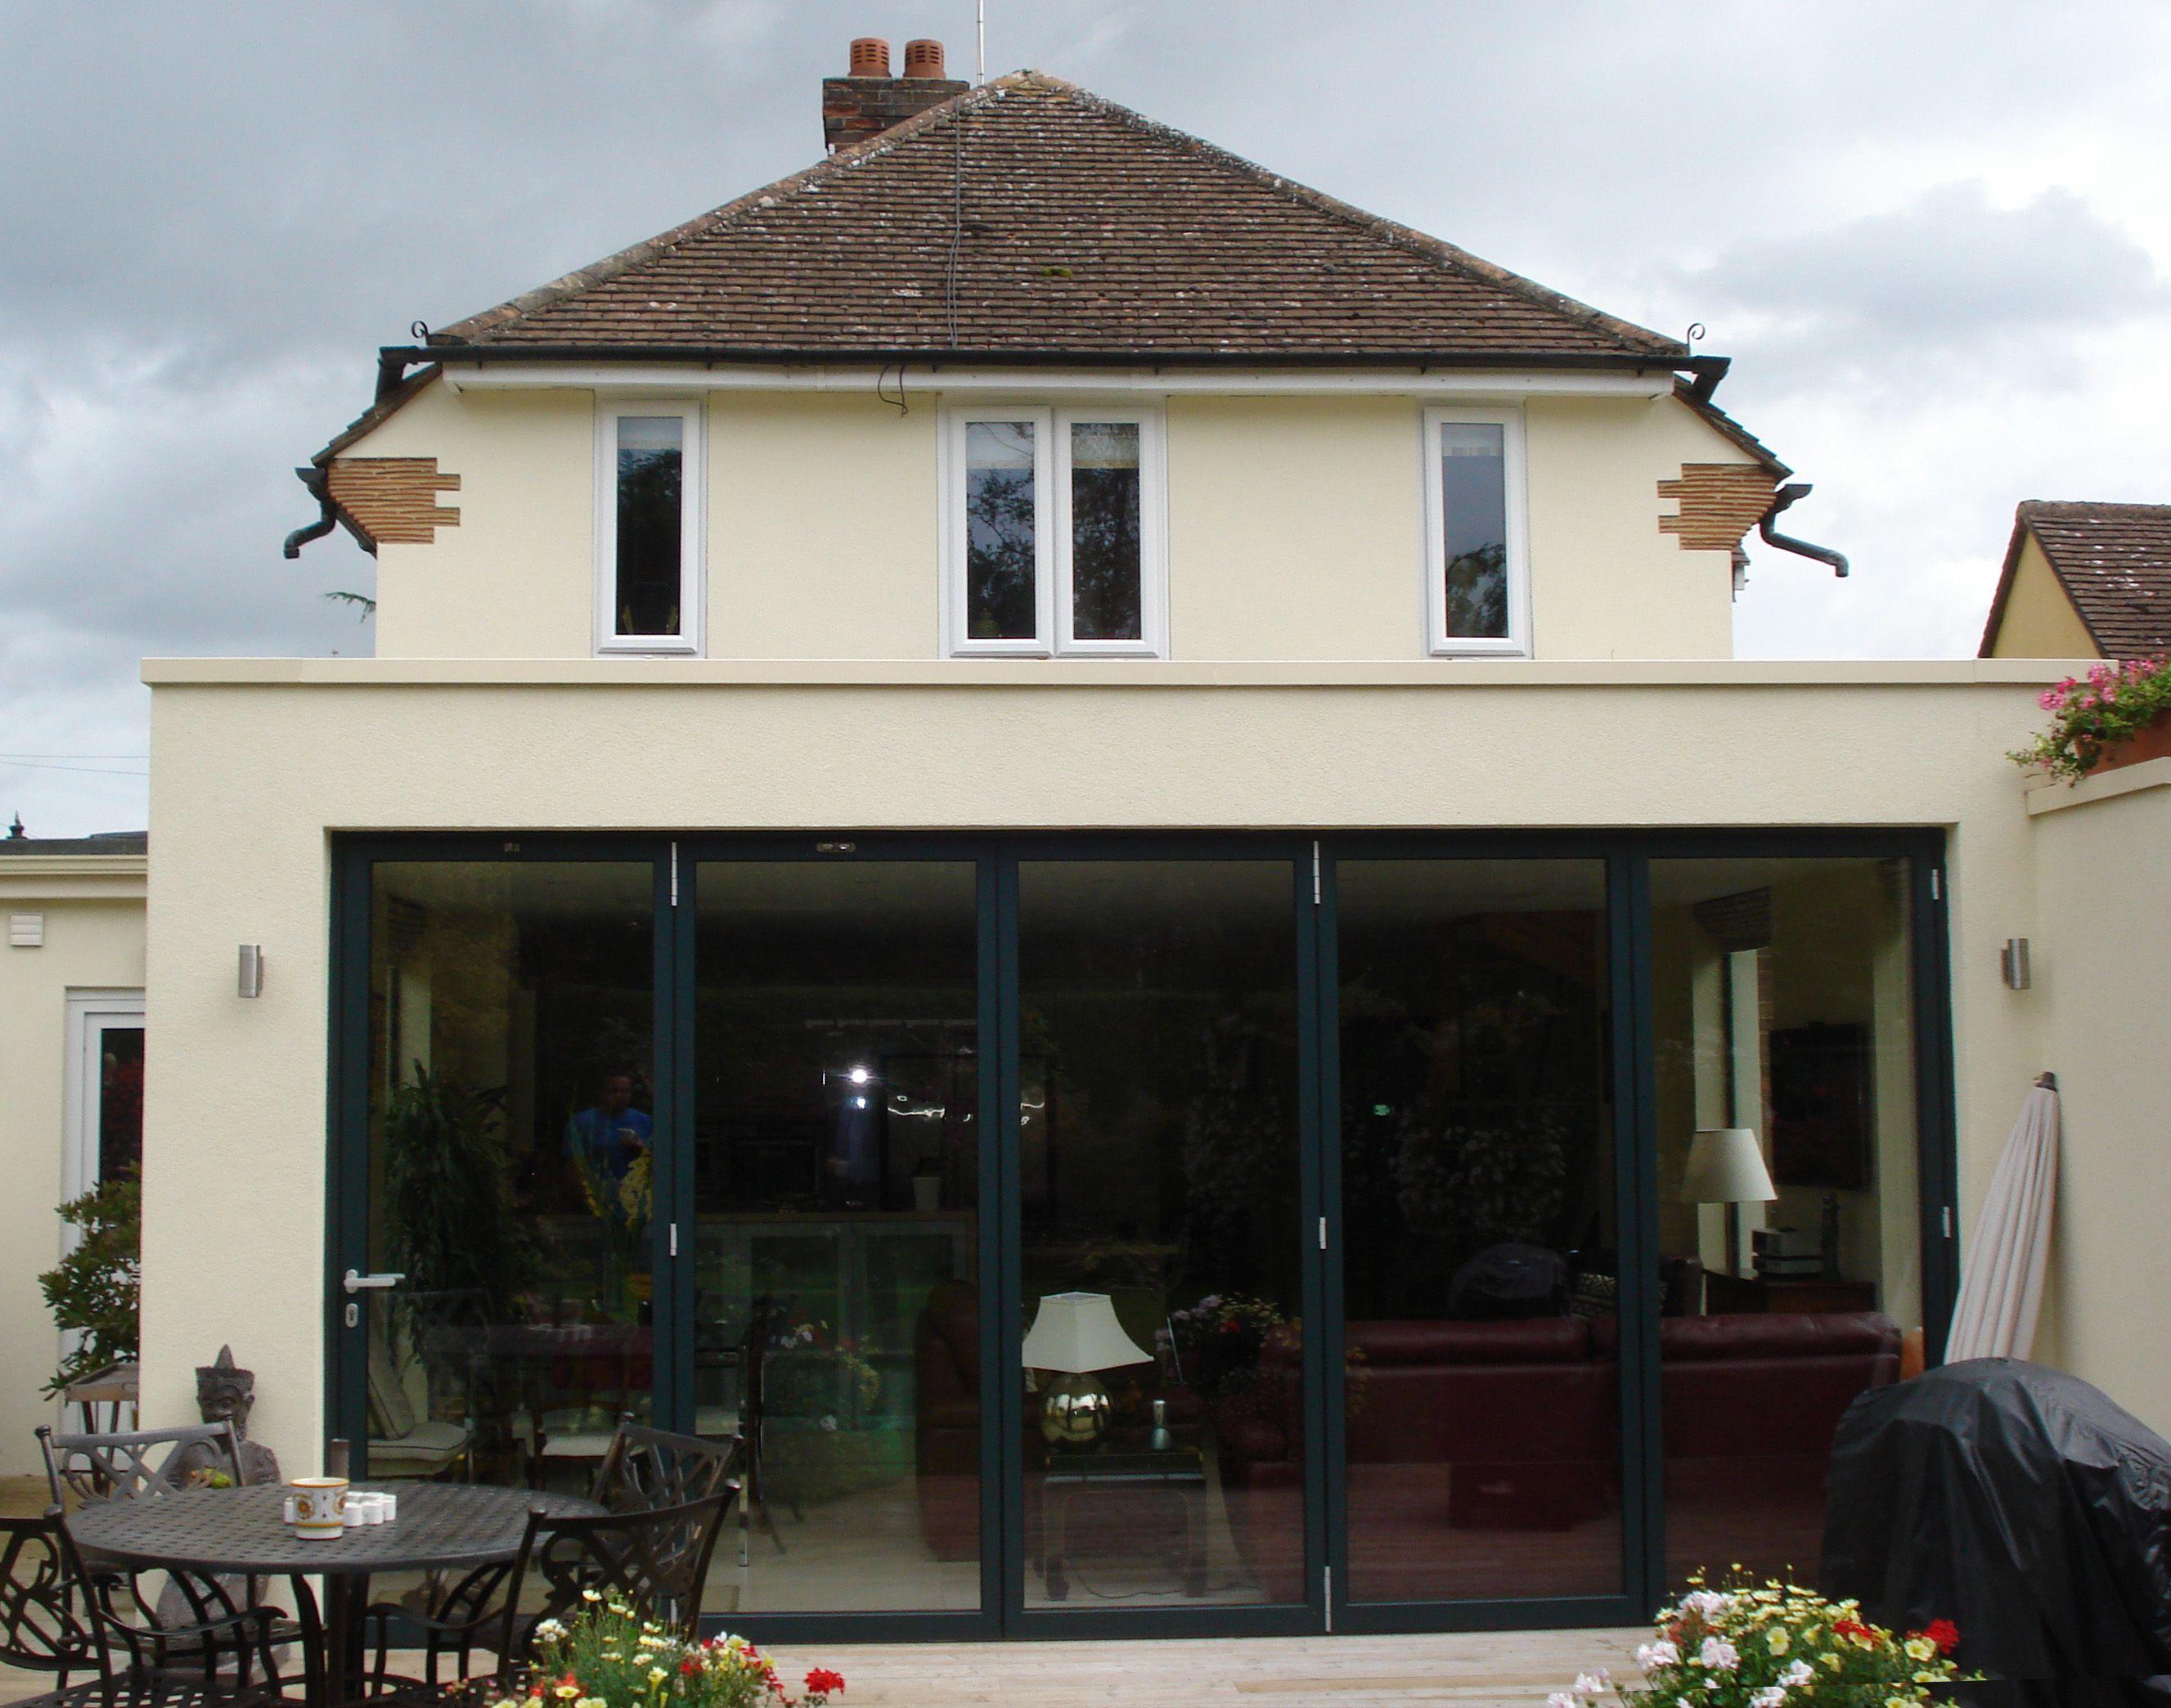 parapet roof design - Google Search | House extensions | Pinterest ...